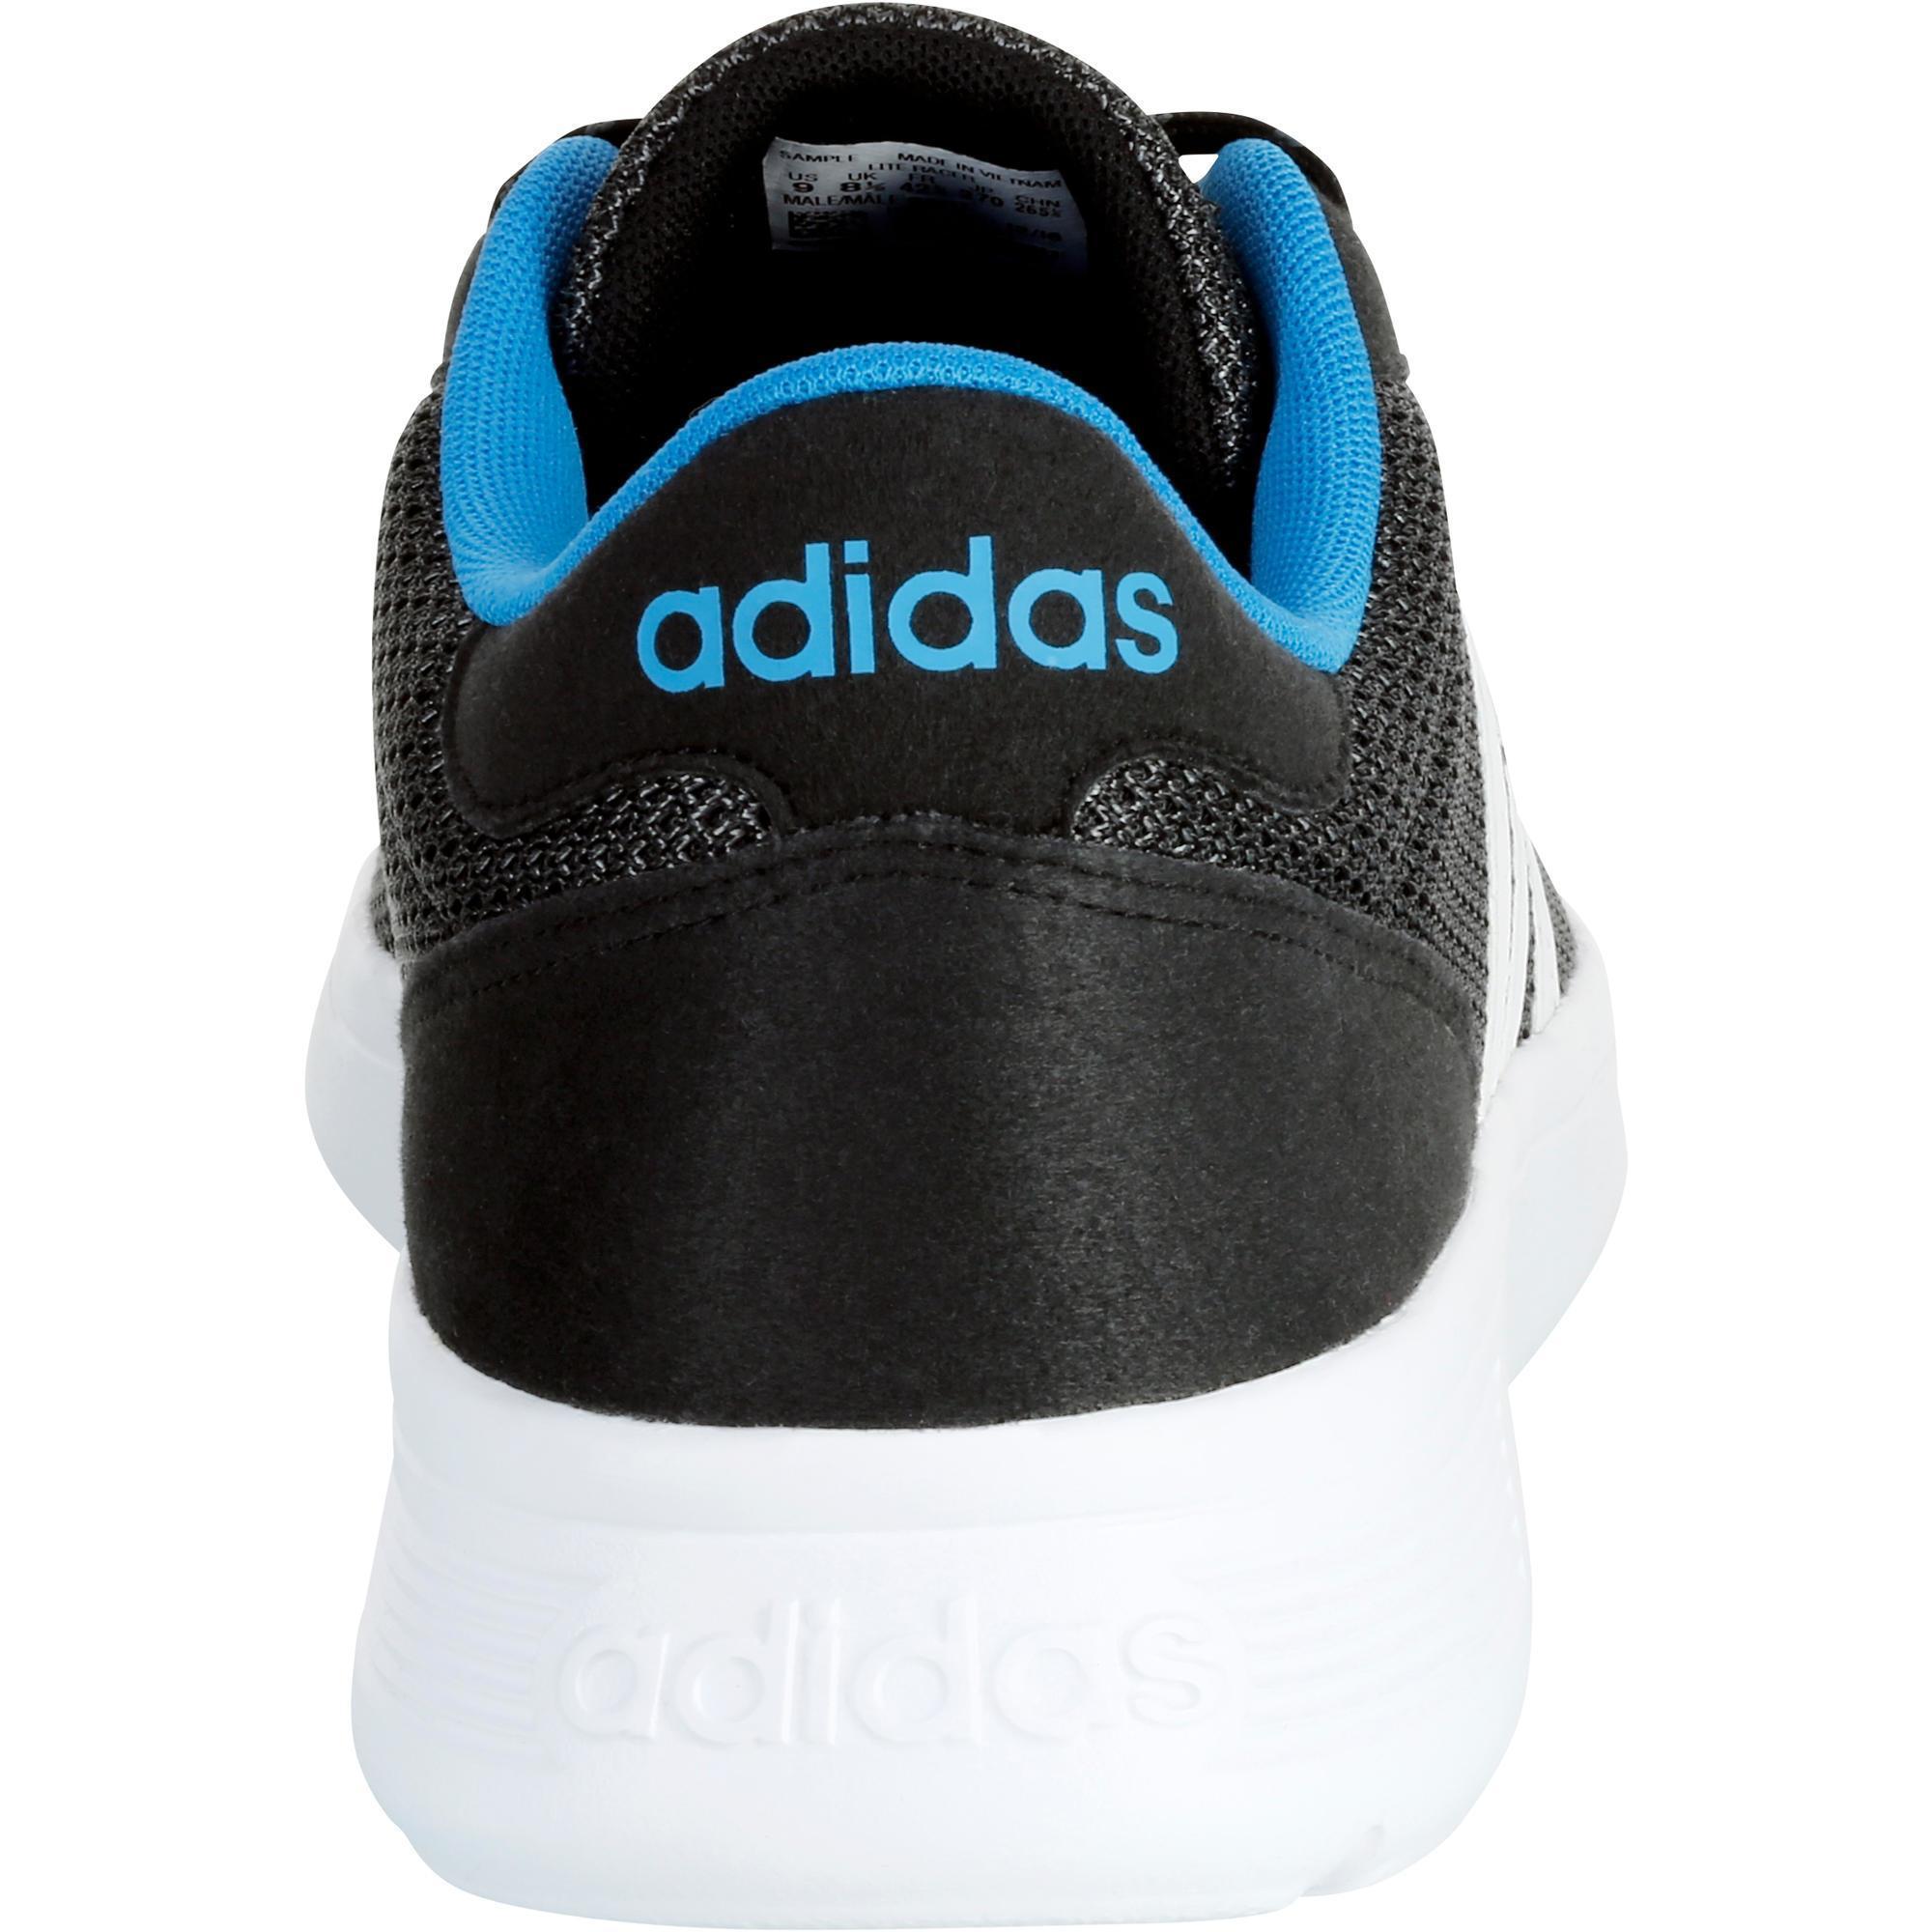 00688711f018c Marche Racer Gris Lite Adidas Homme Bleu Chaussures Sportive Fq5ww41v